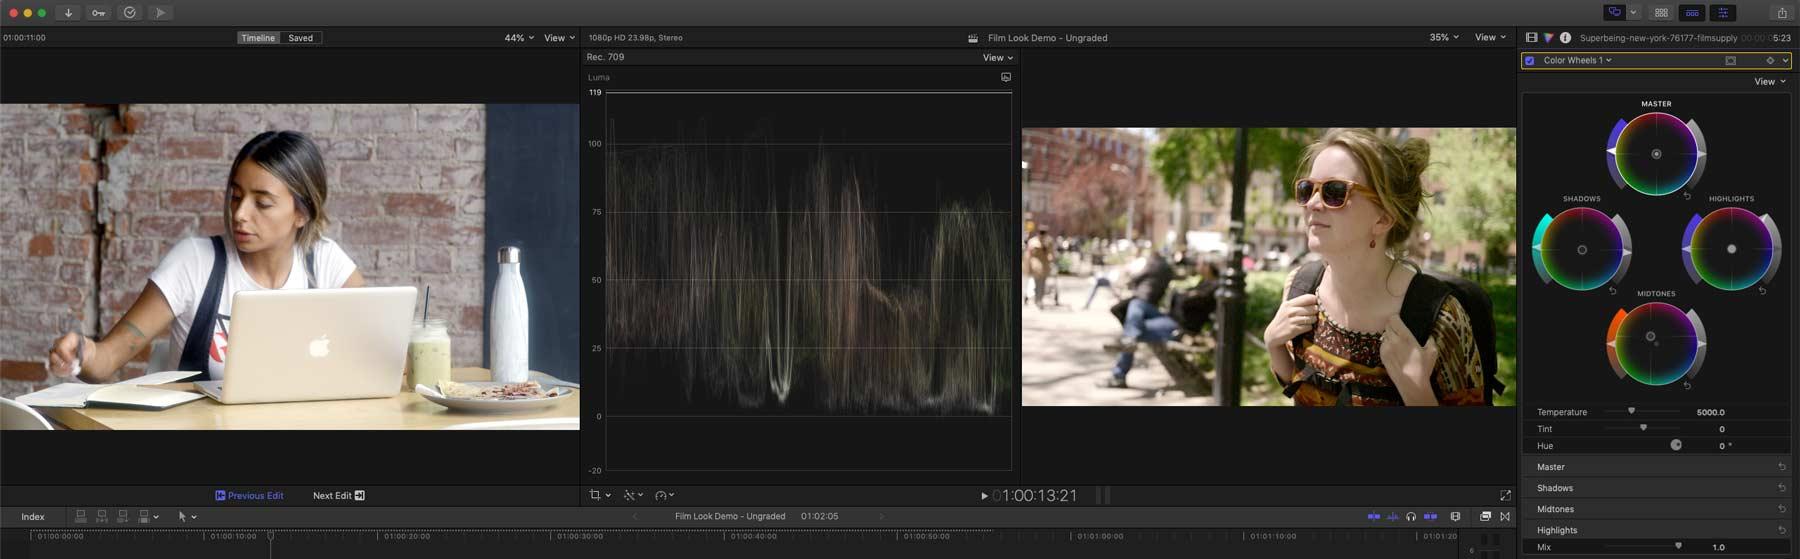 FilmLook ClipGradeWithComparison